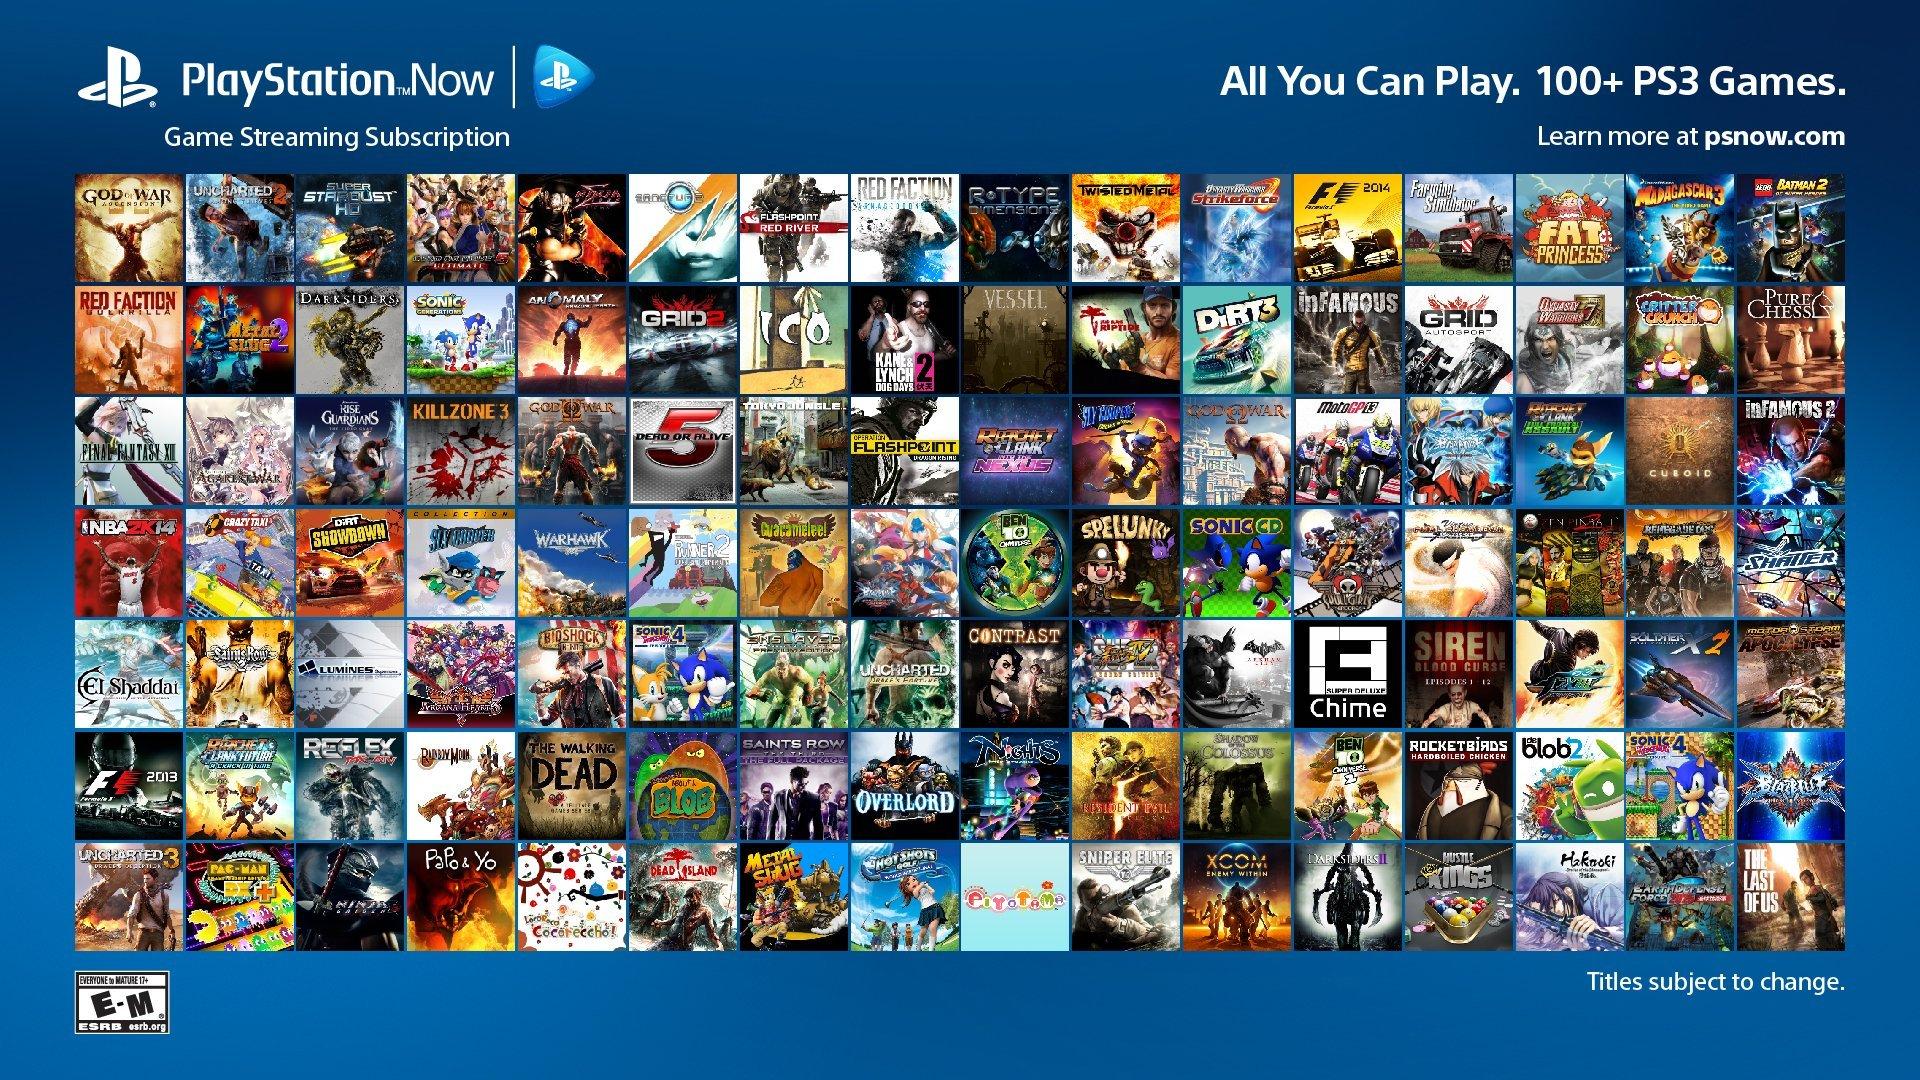 http://ecx.images-amazon.com/images/I/91jK%2BIXFDhL.jpg